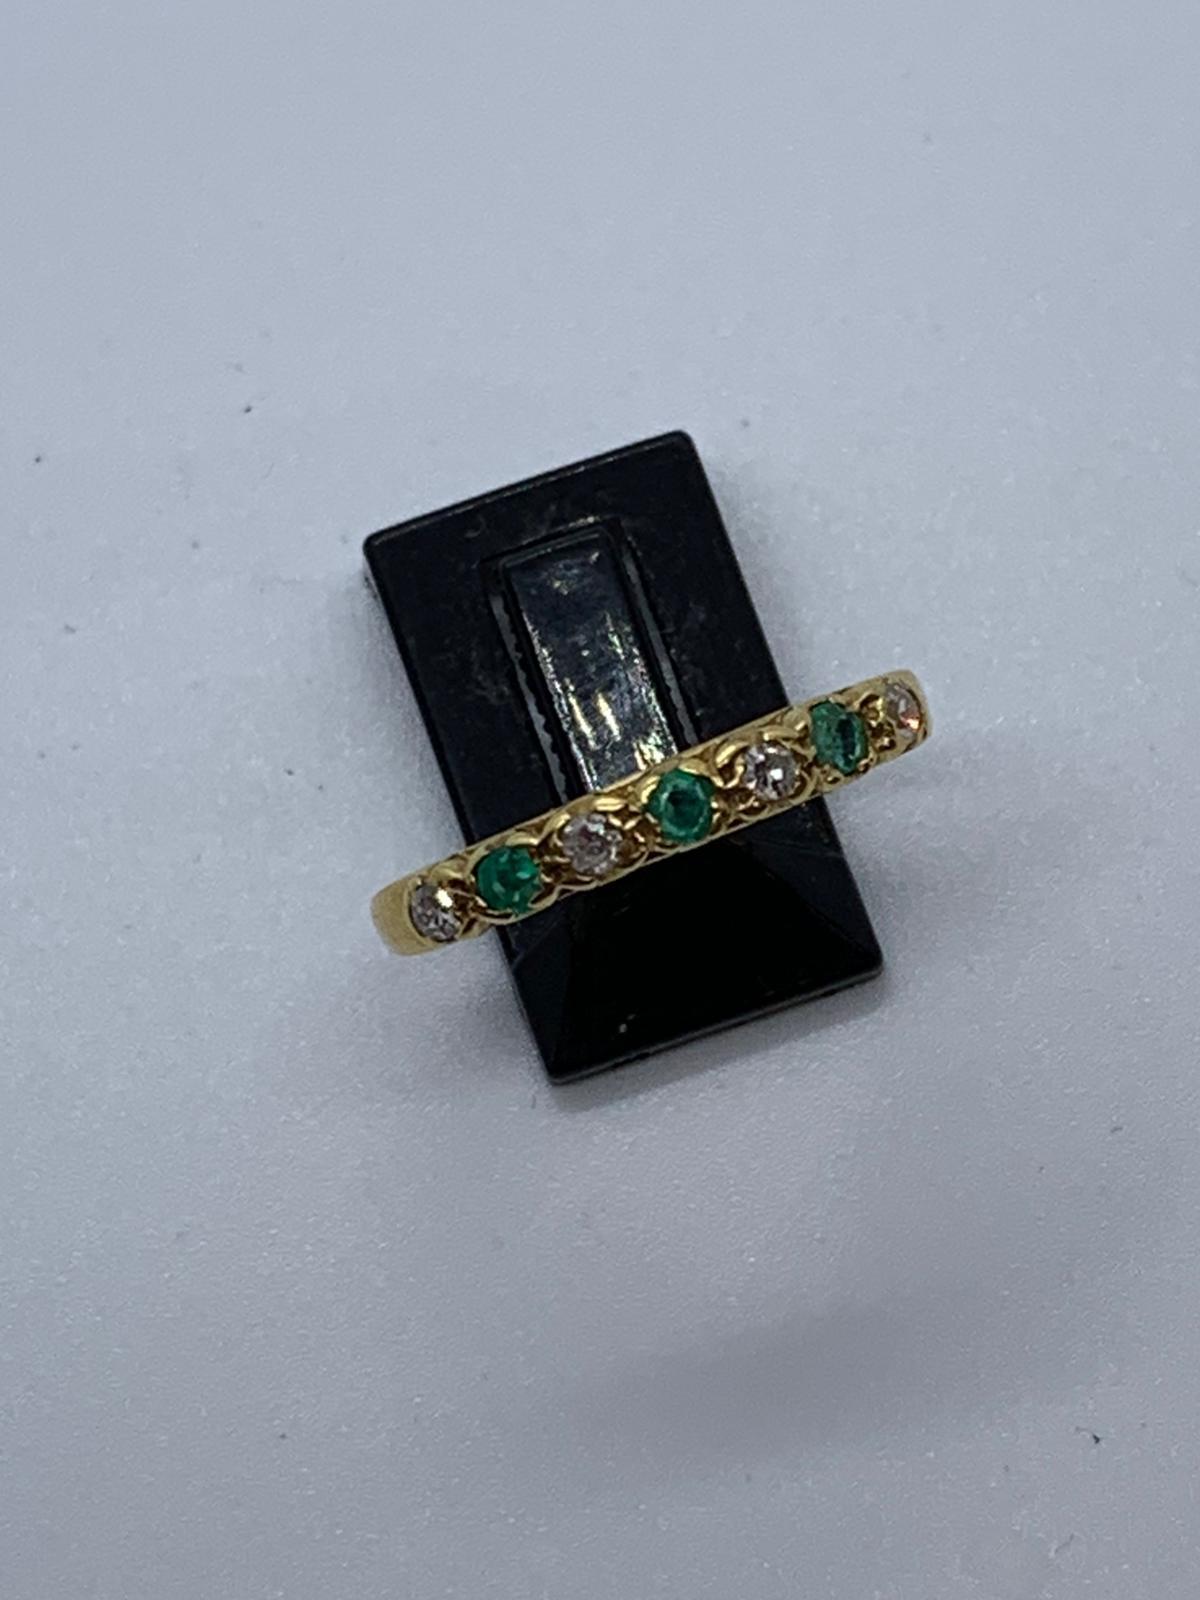 Lot 25 - 18ct gold emerald & diamond ring